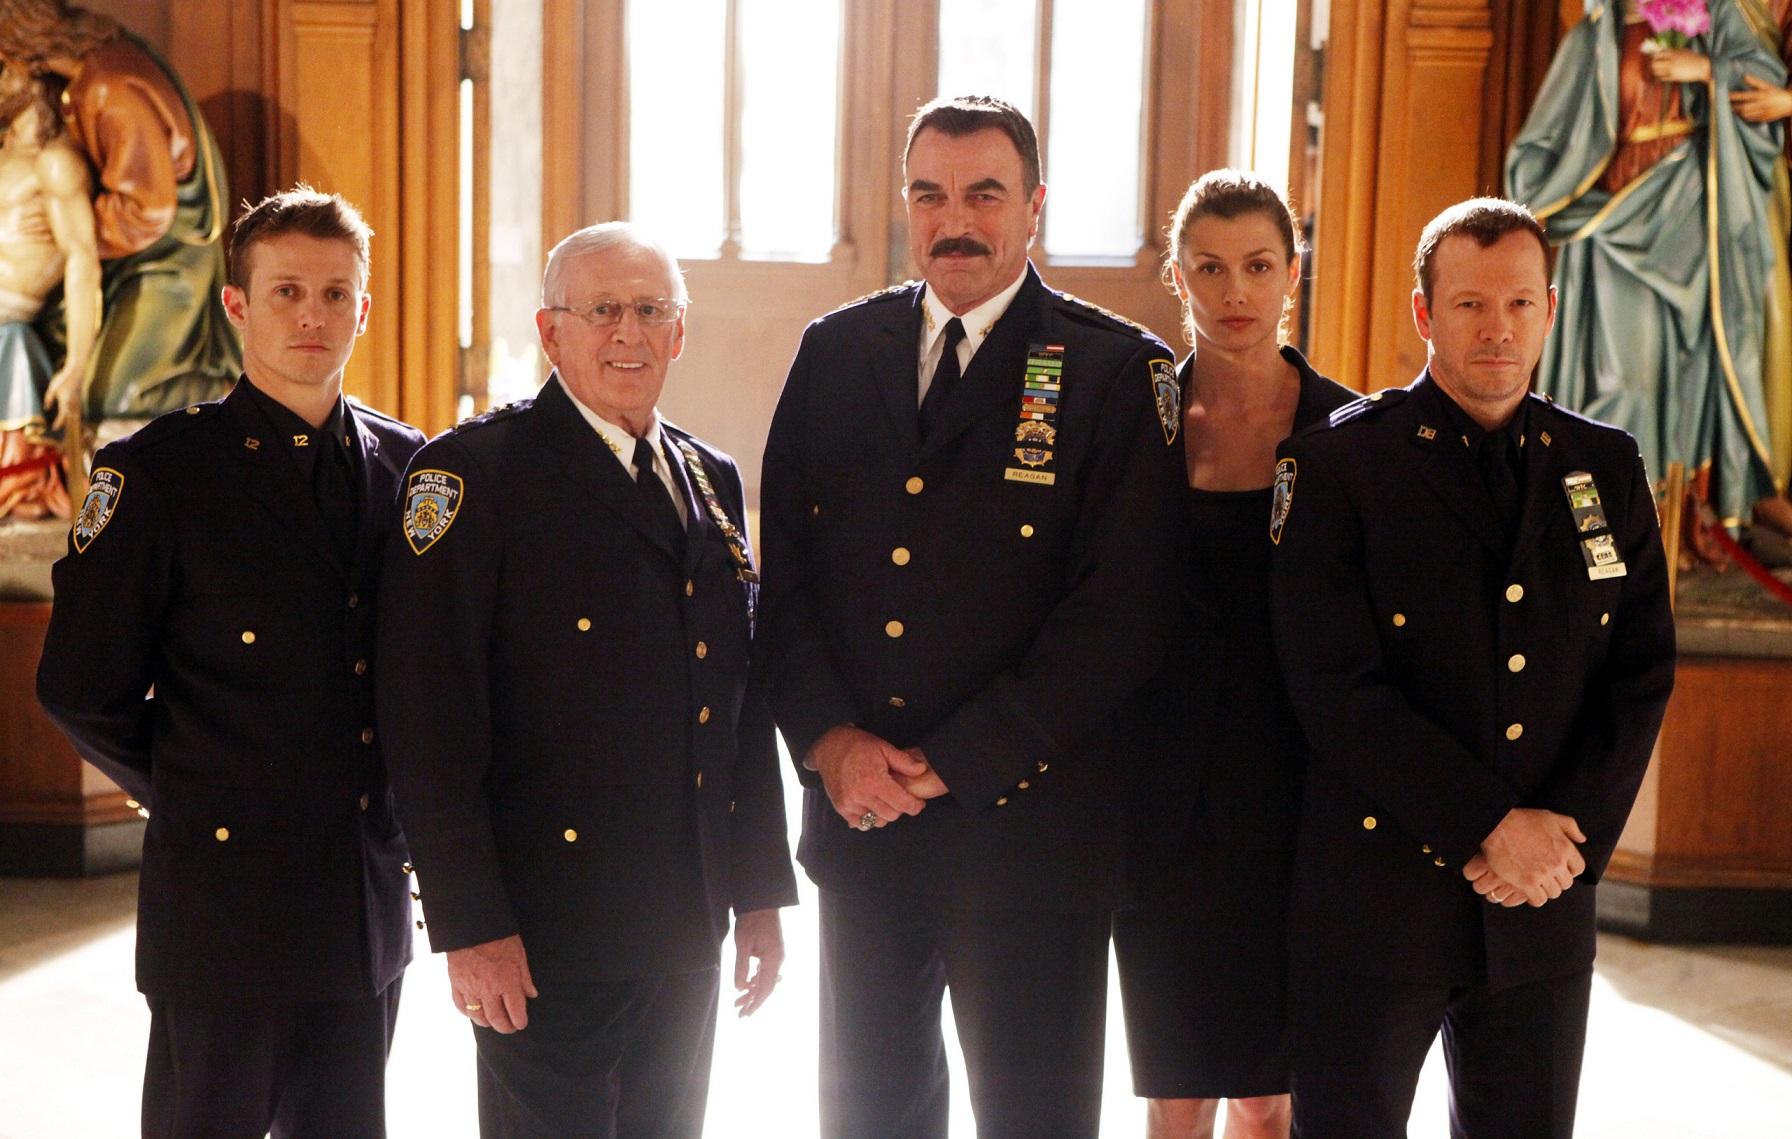 Donnie Bridget Will Len Tom in a photo shoot wearing police uniform